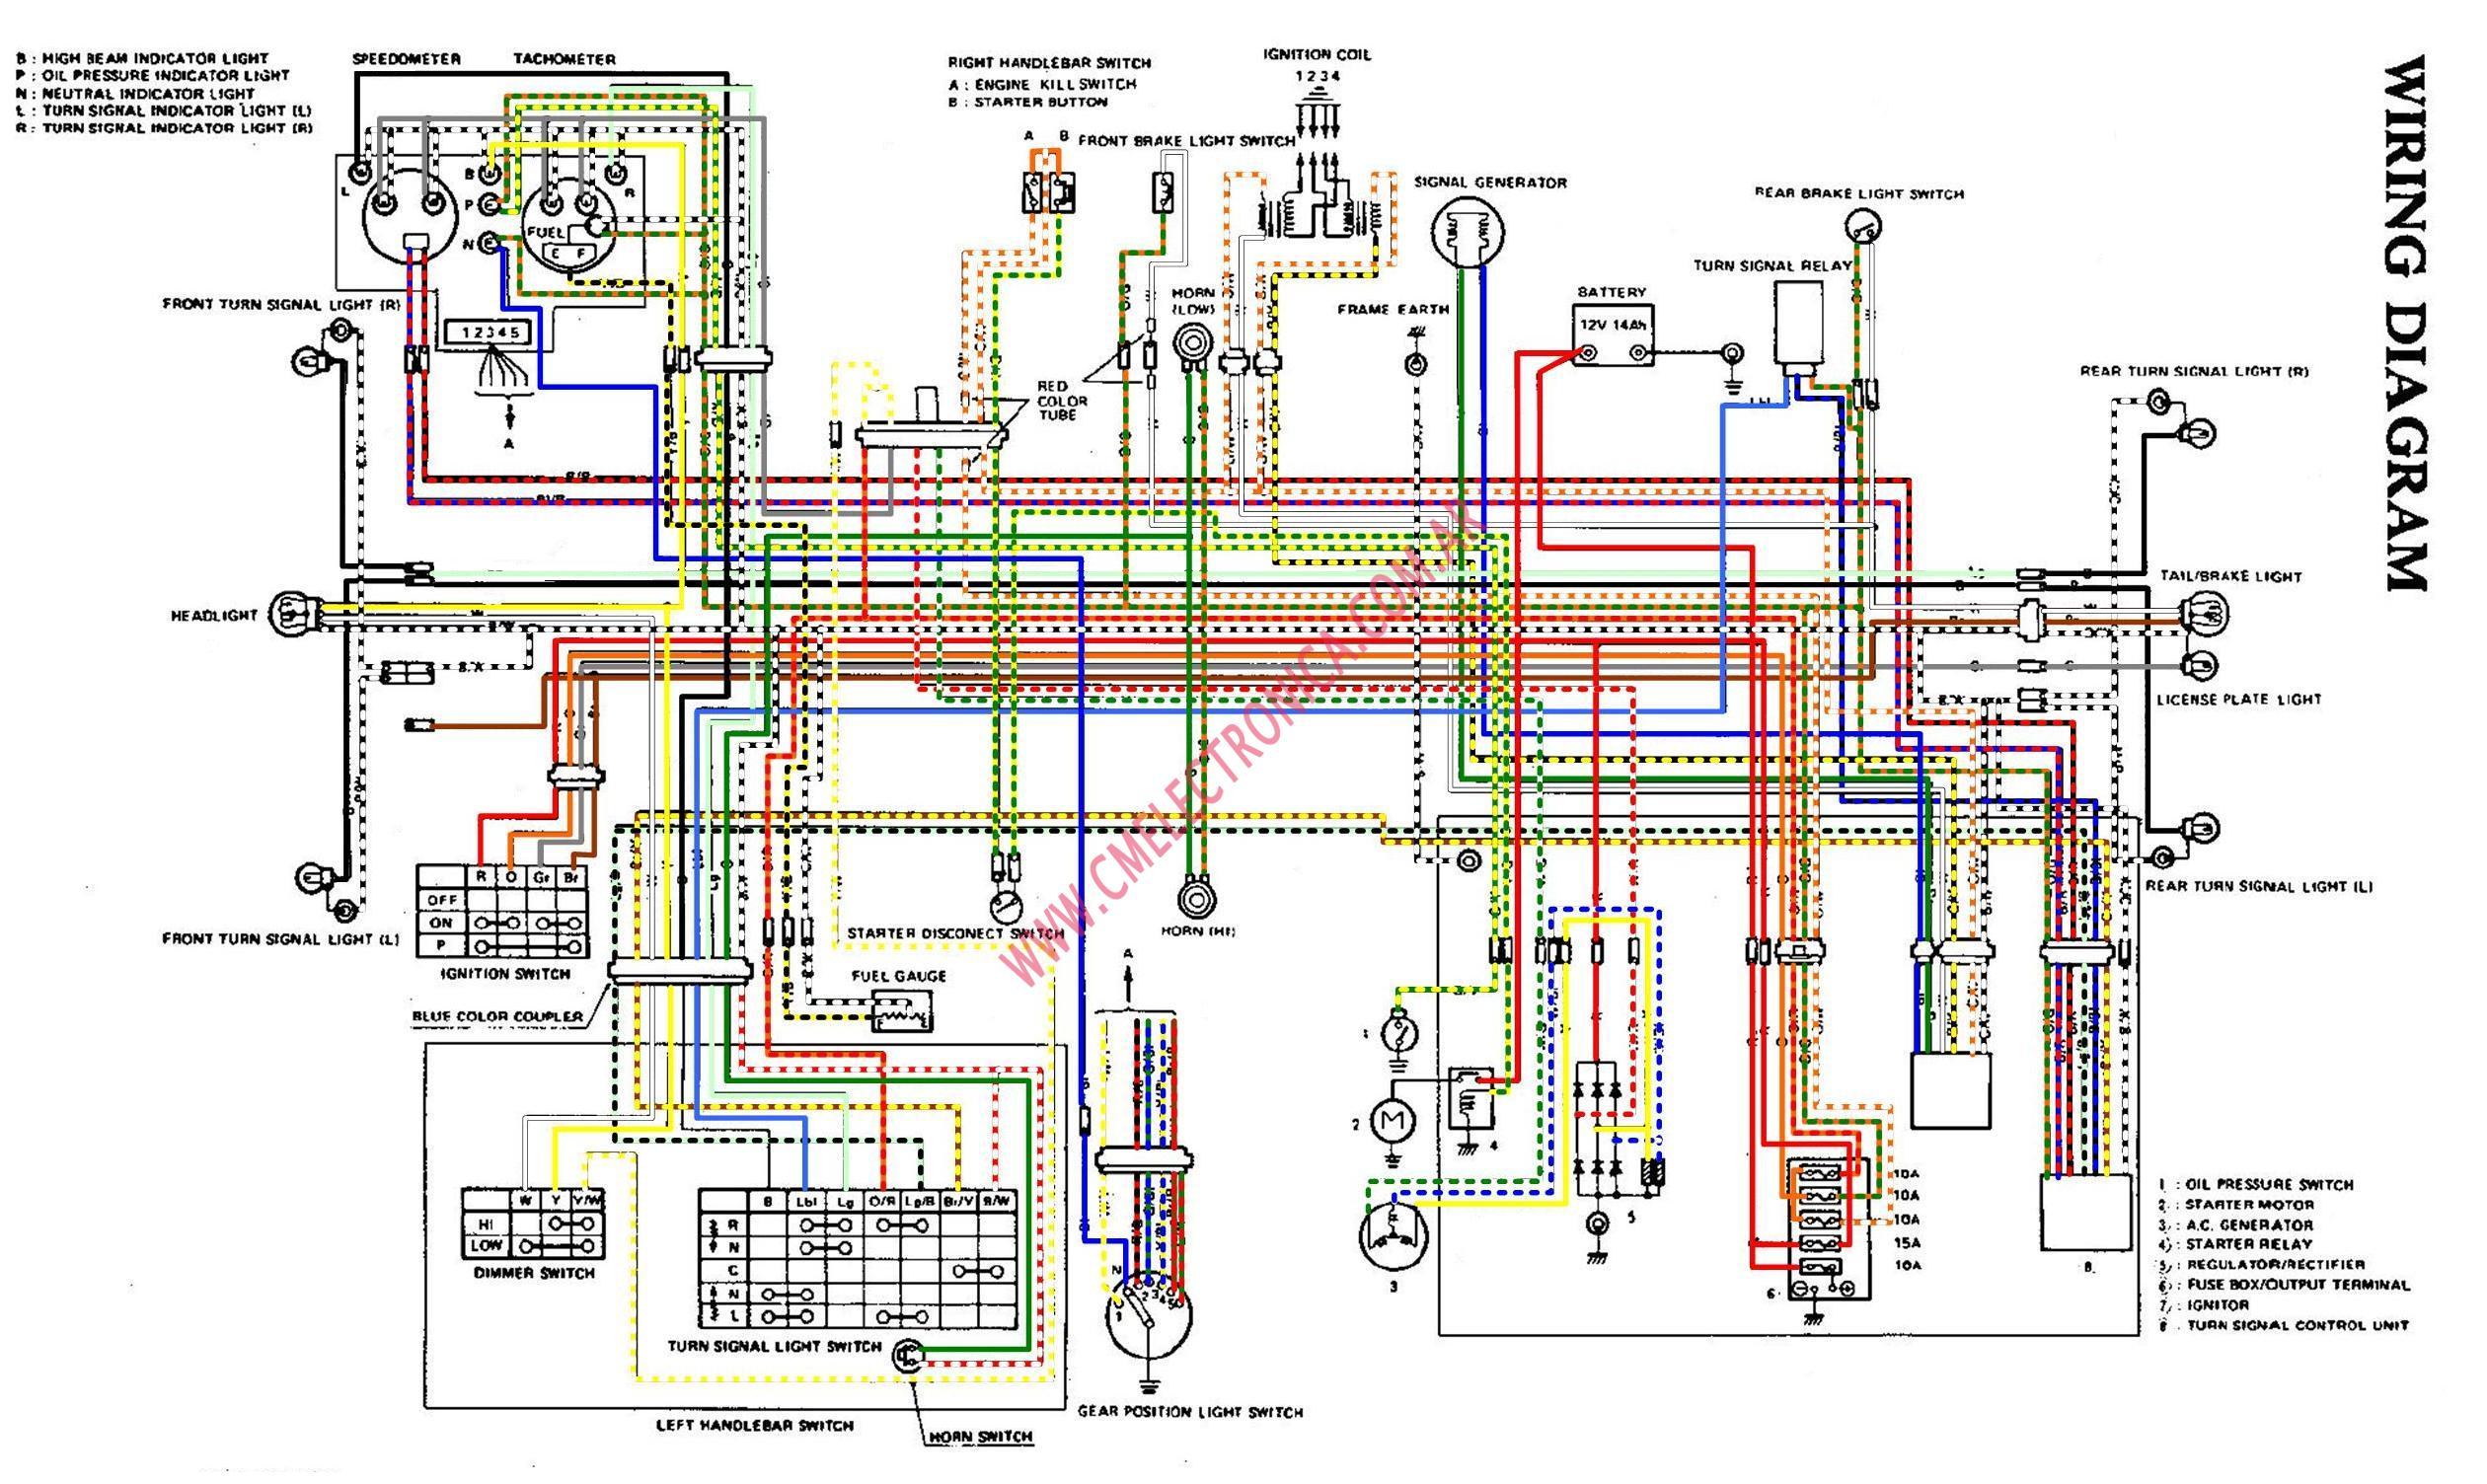 Gs450 Wiring Diagram - Wiring Data Diagram on suzuki ts90 wiring diagram, suzuki ds80 wiring diagram, suzuki gn400 wiring diagram, suzuki ts250 wiring diagram, suzuki t500 wiring diagram, suzuki gs750 wiring diagram, suzuki ls650 wiring diagram, suzuki lt125 wiring diagram,